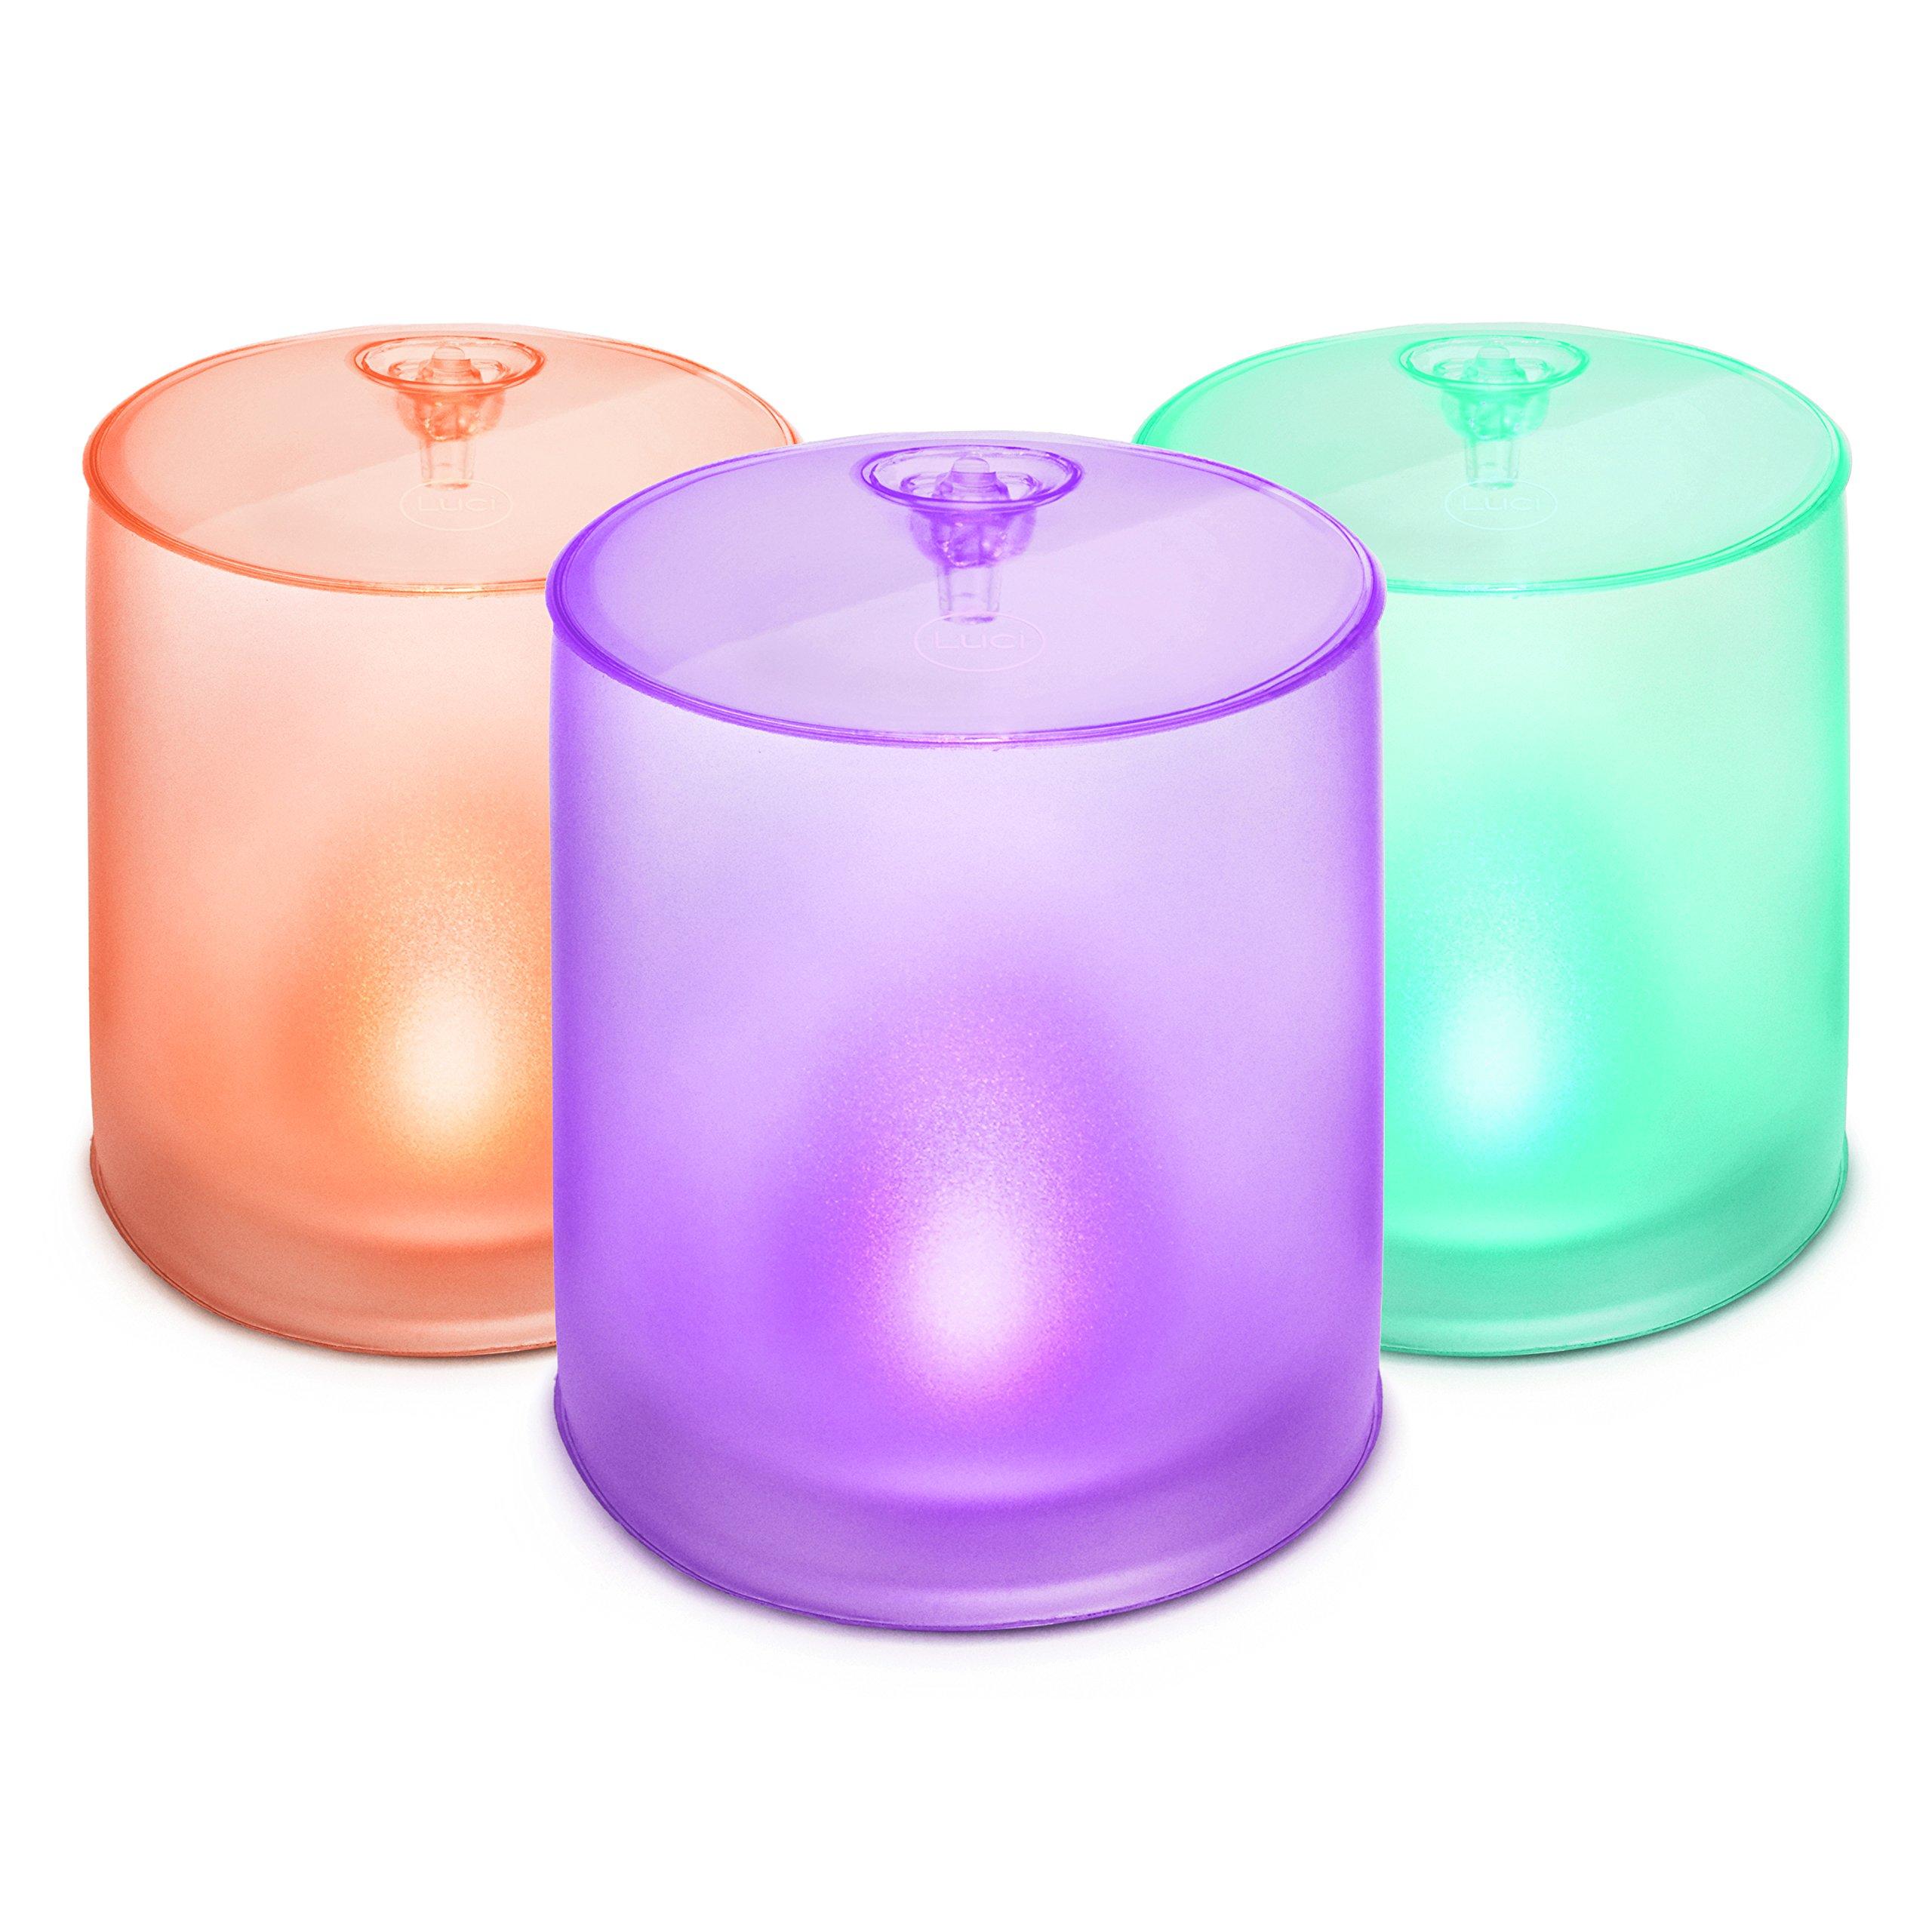 MPOWERD Luci Essence Mini Trio - Multi-Color Solar Inflatable Light (3-Pack)